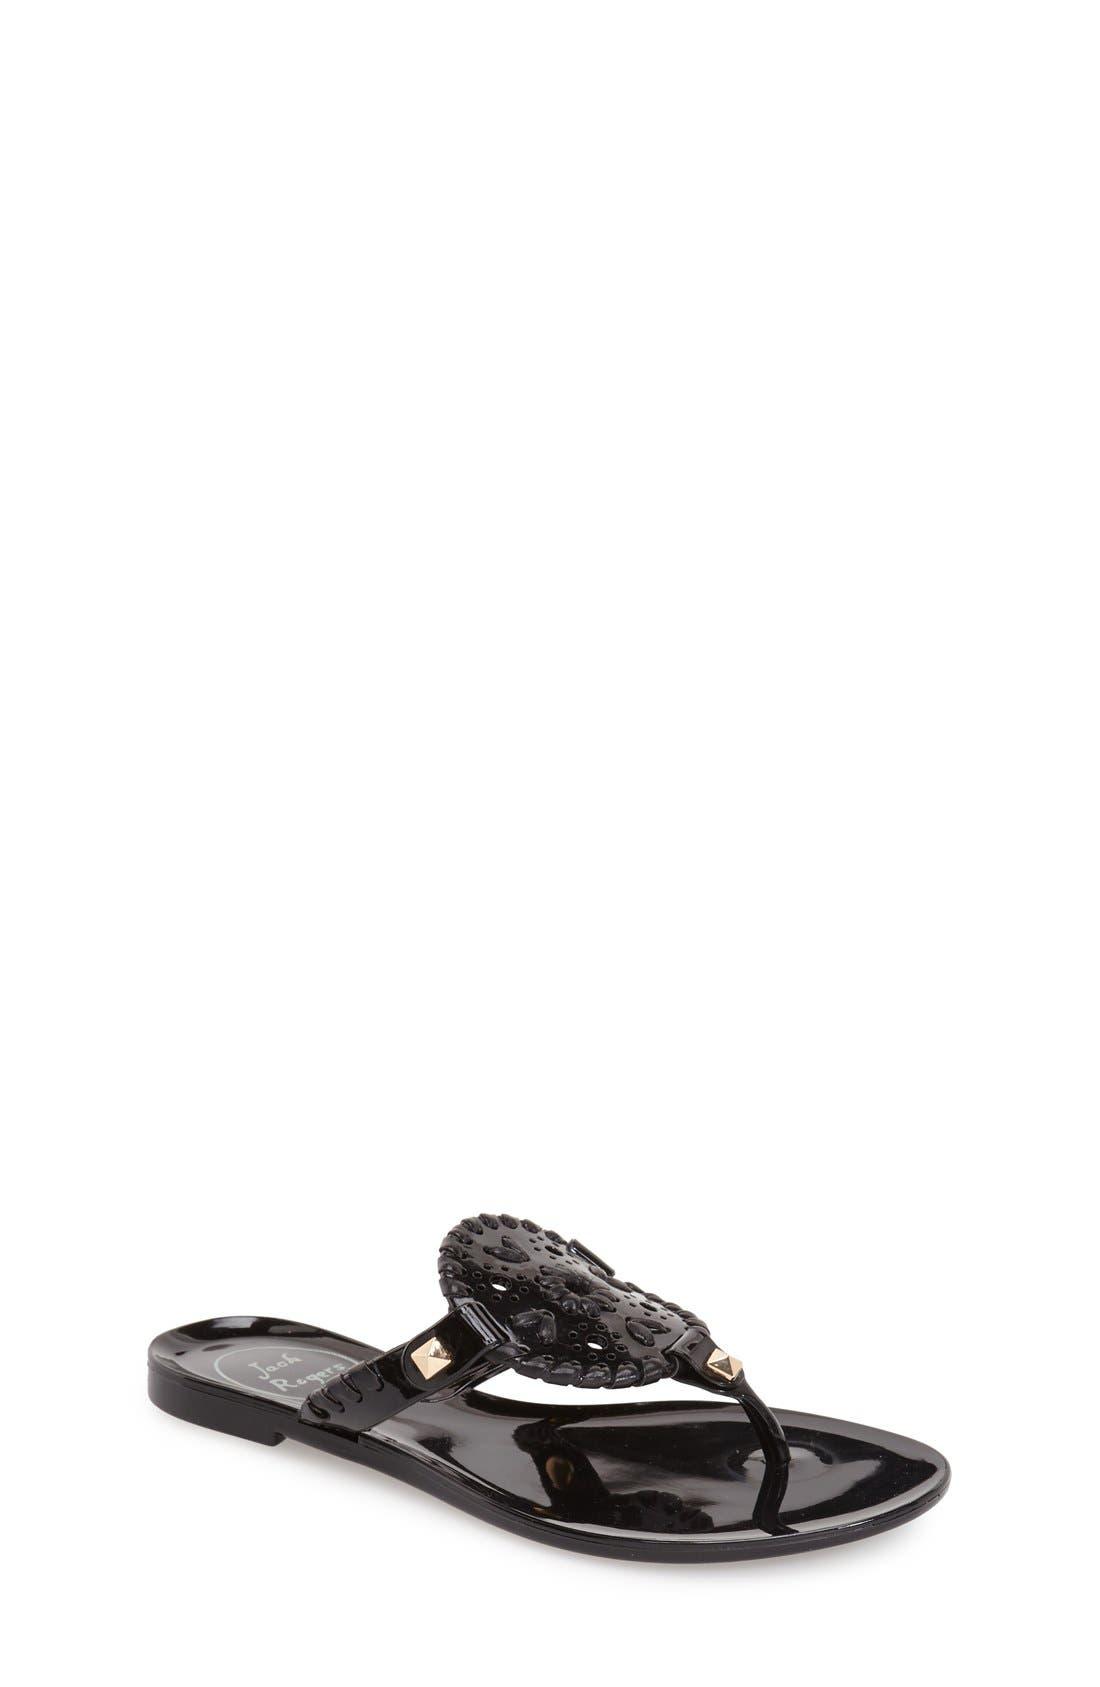 'Miss Georgica' Jelly Flip Flop,                         Main,                         color, Black